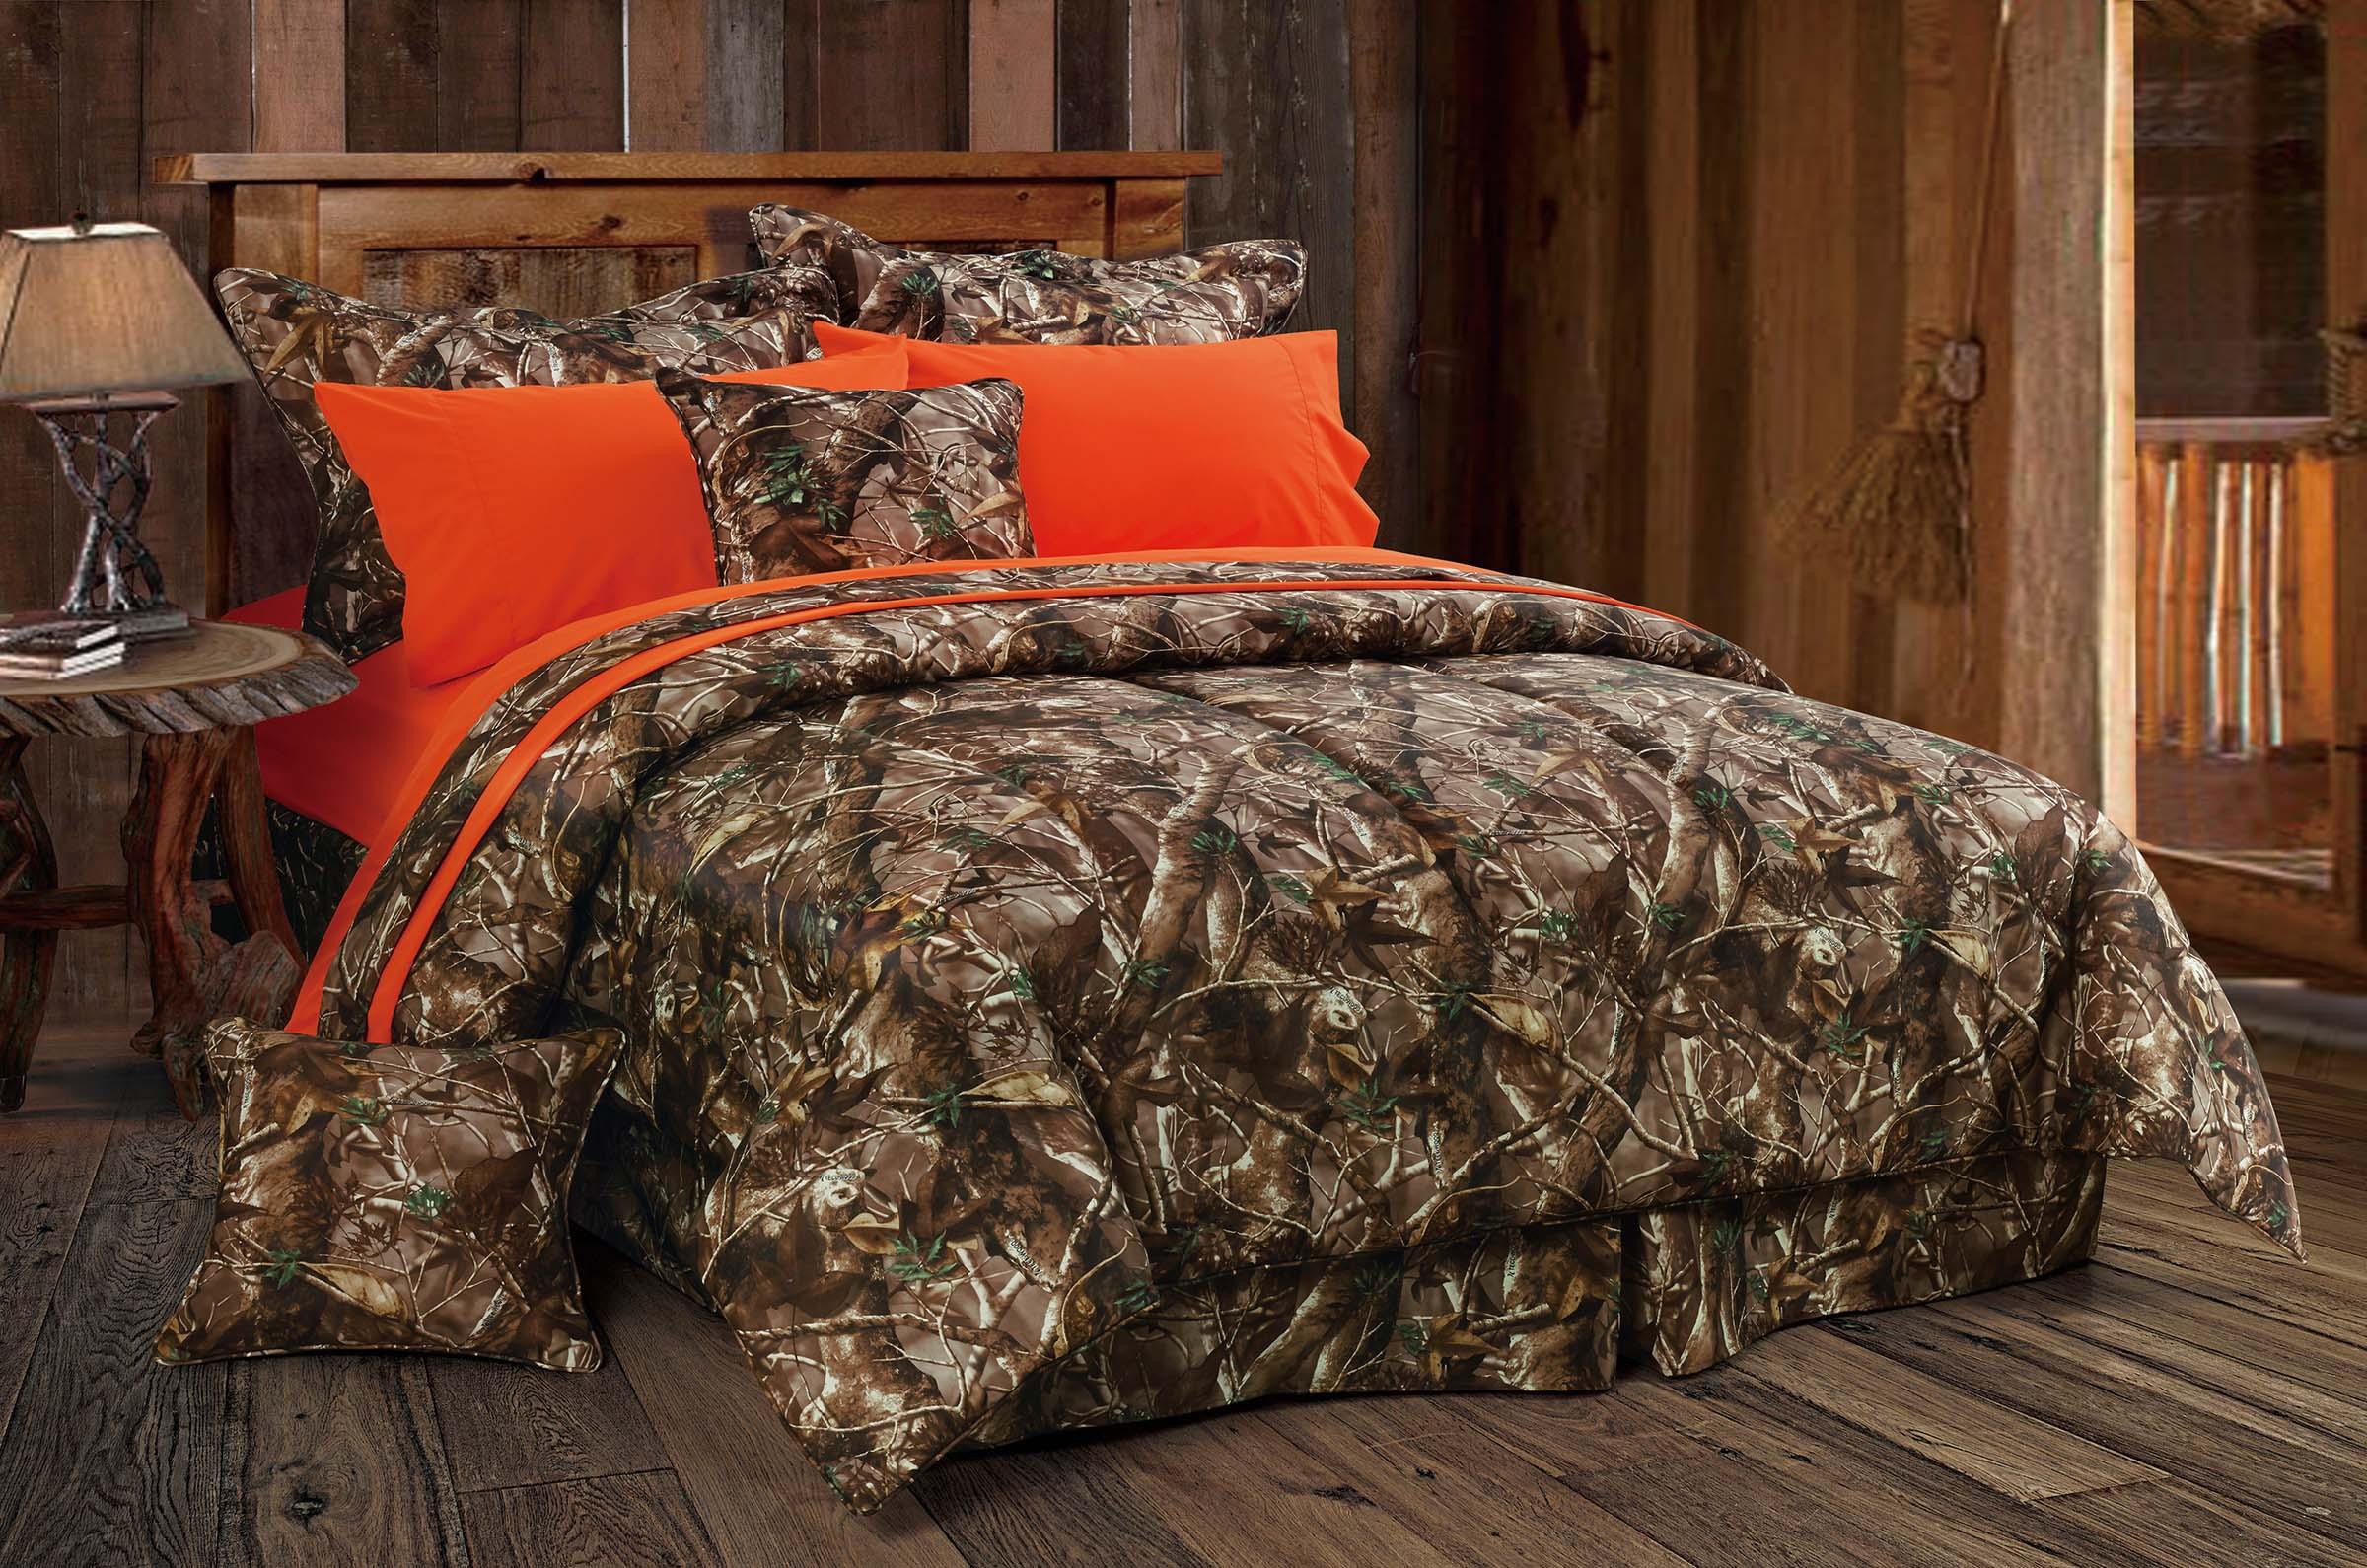 CM1001 Bedding with Orange individual.jpg